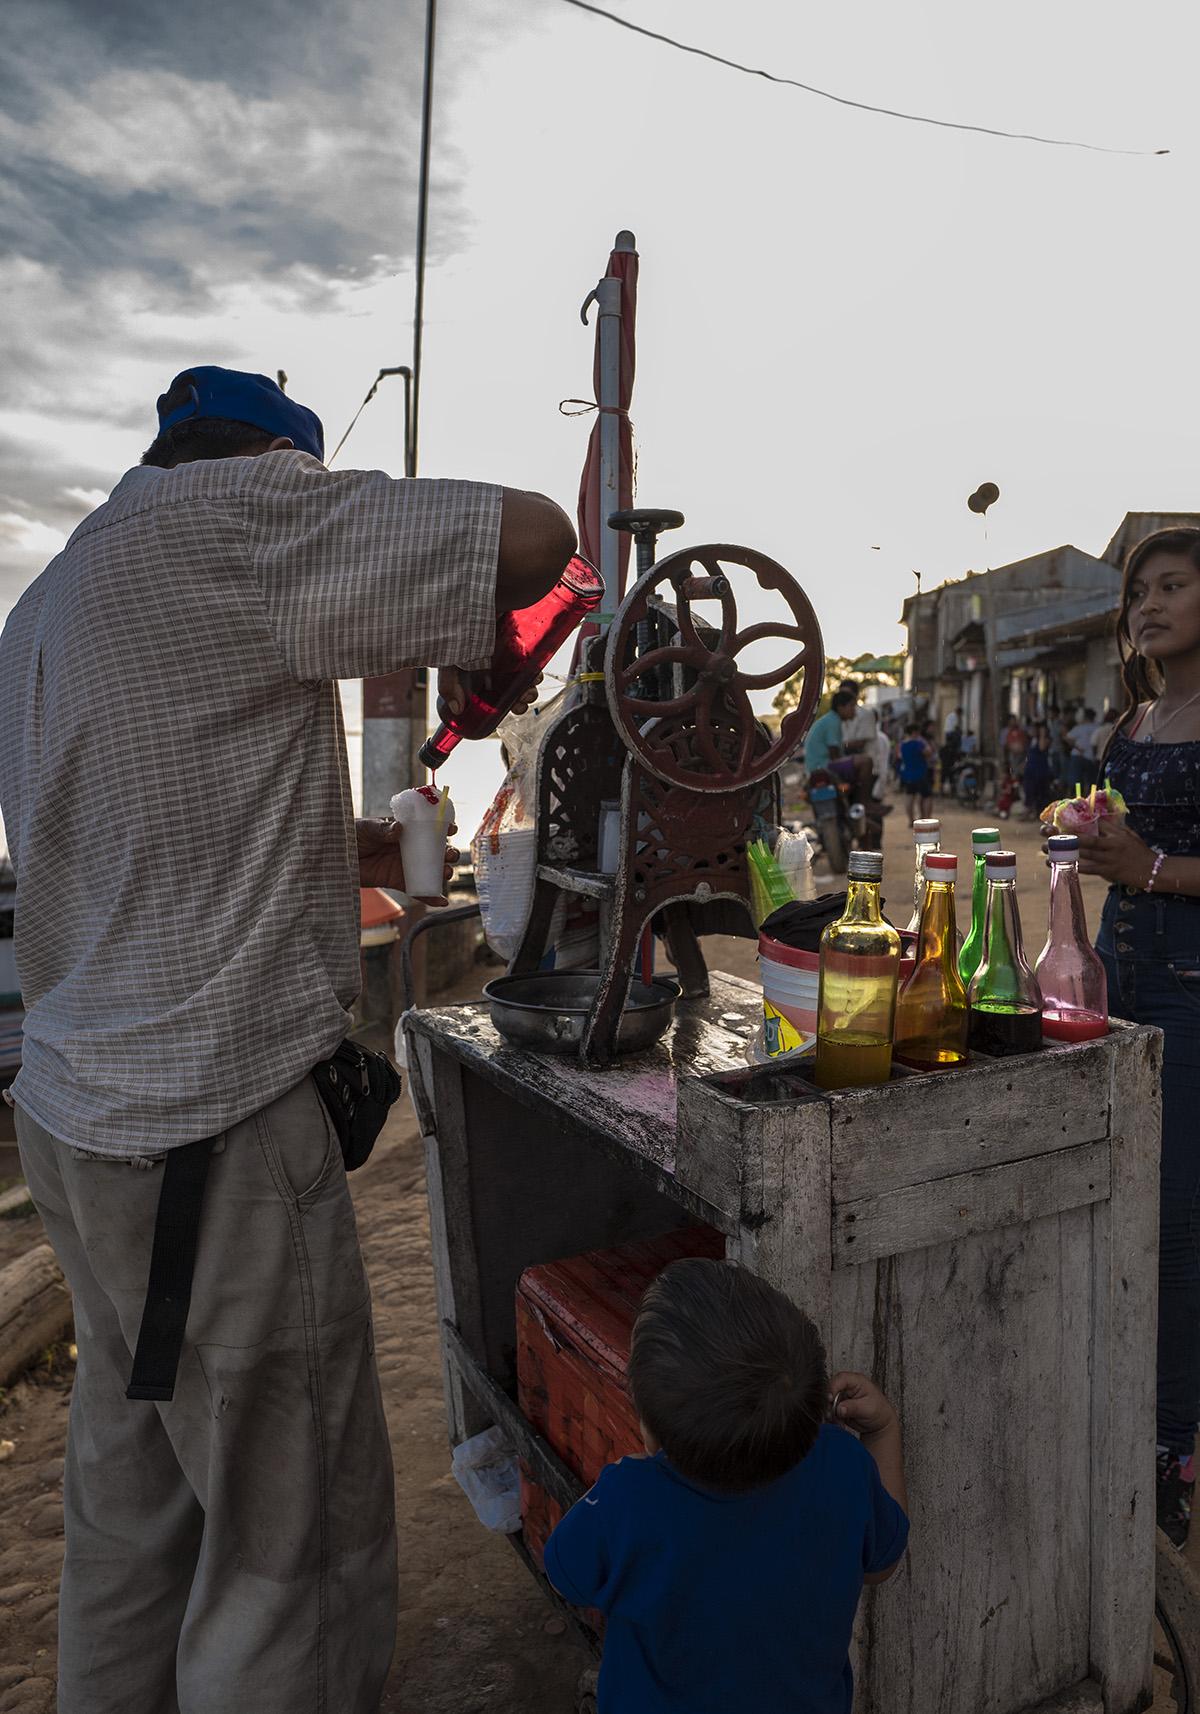 Fotoseries_Peru_image15.jpg